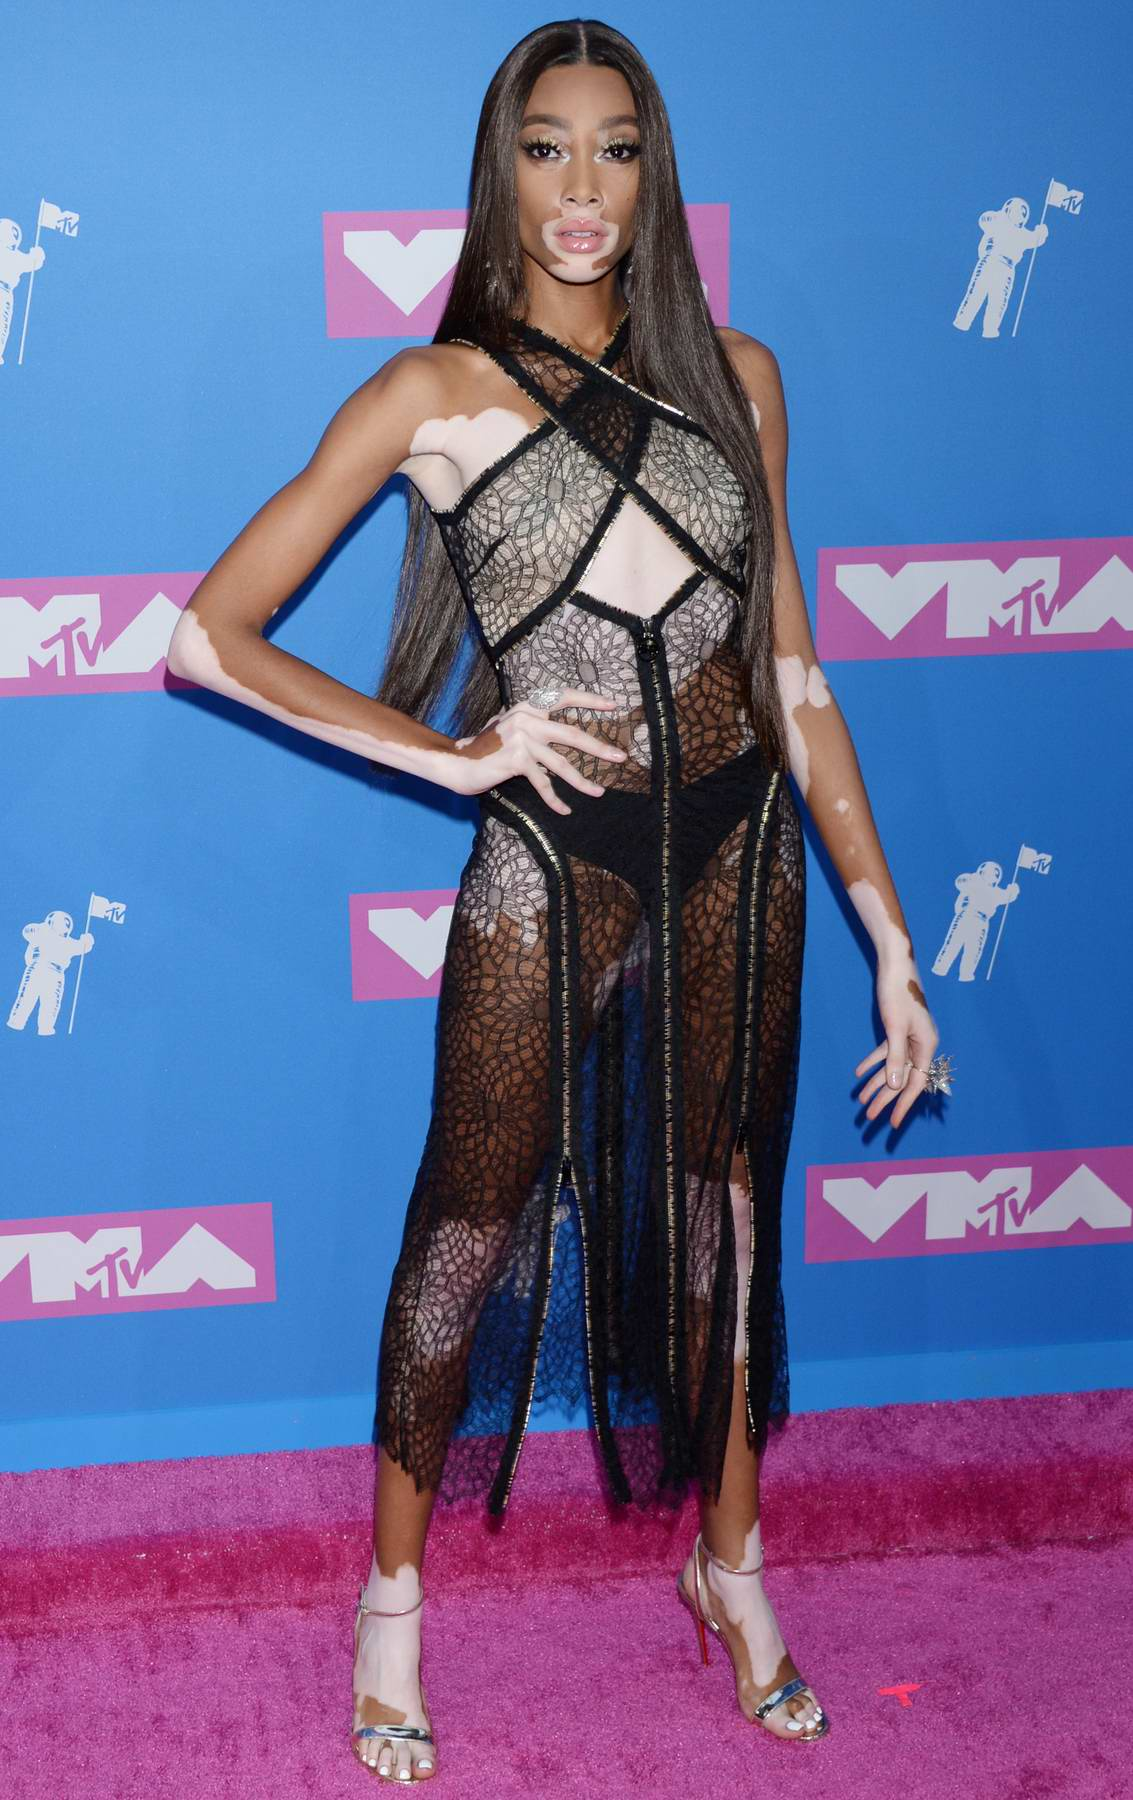 Winnie Harlow wearing Sonia Rykel at the 2018 MTV Video Music Awards (MTV VMA 2018) at Radio City Music Hall in New York City